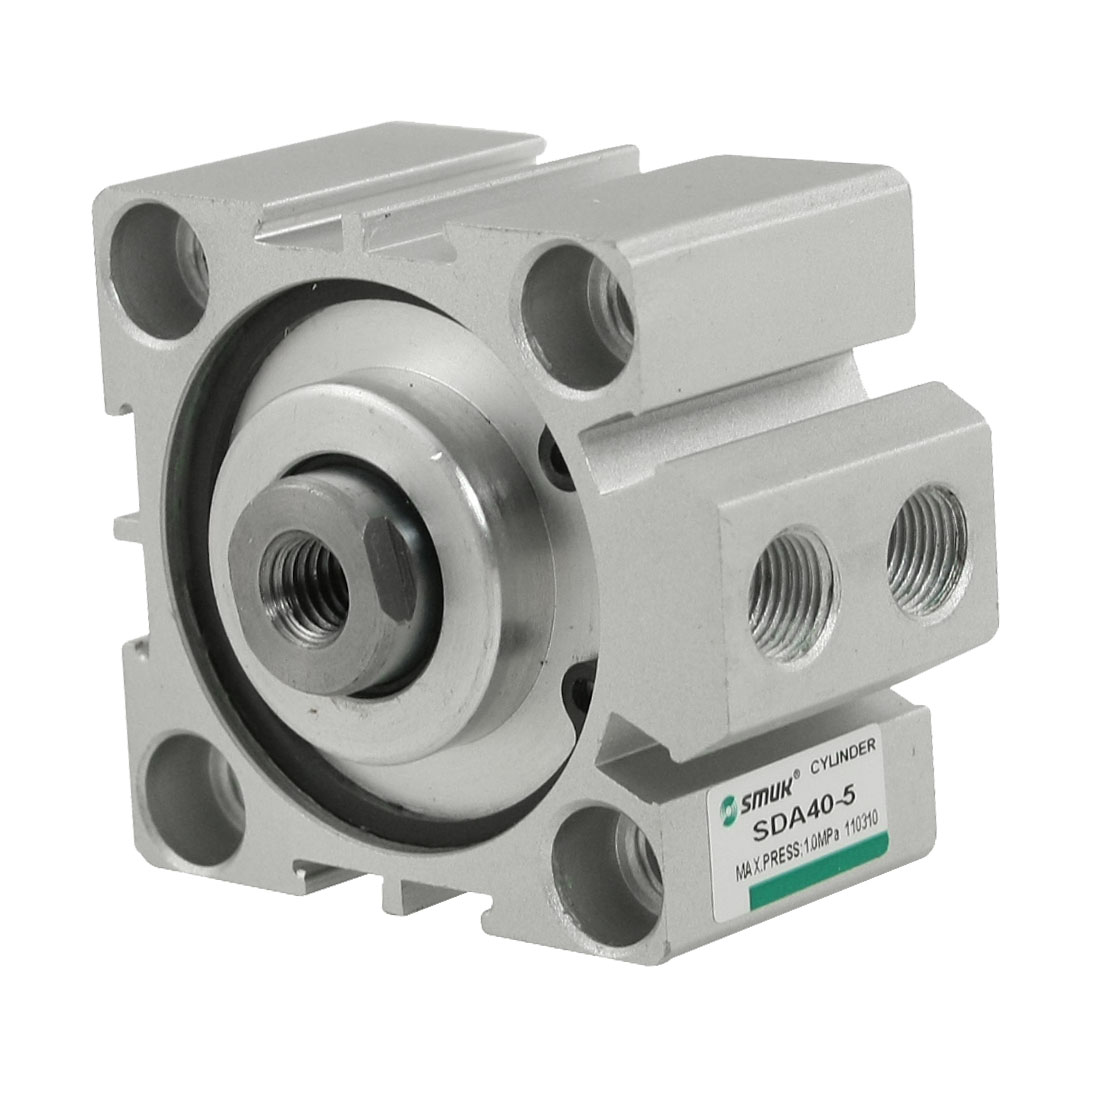 SDA Series 40x5mm 1.0Mpa Press Pneumatic Compact Thin Air Cylinder